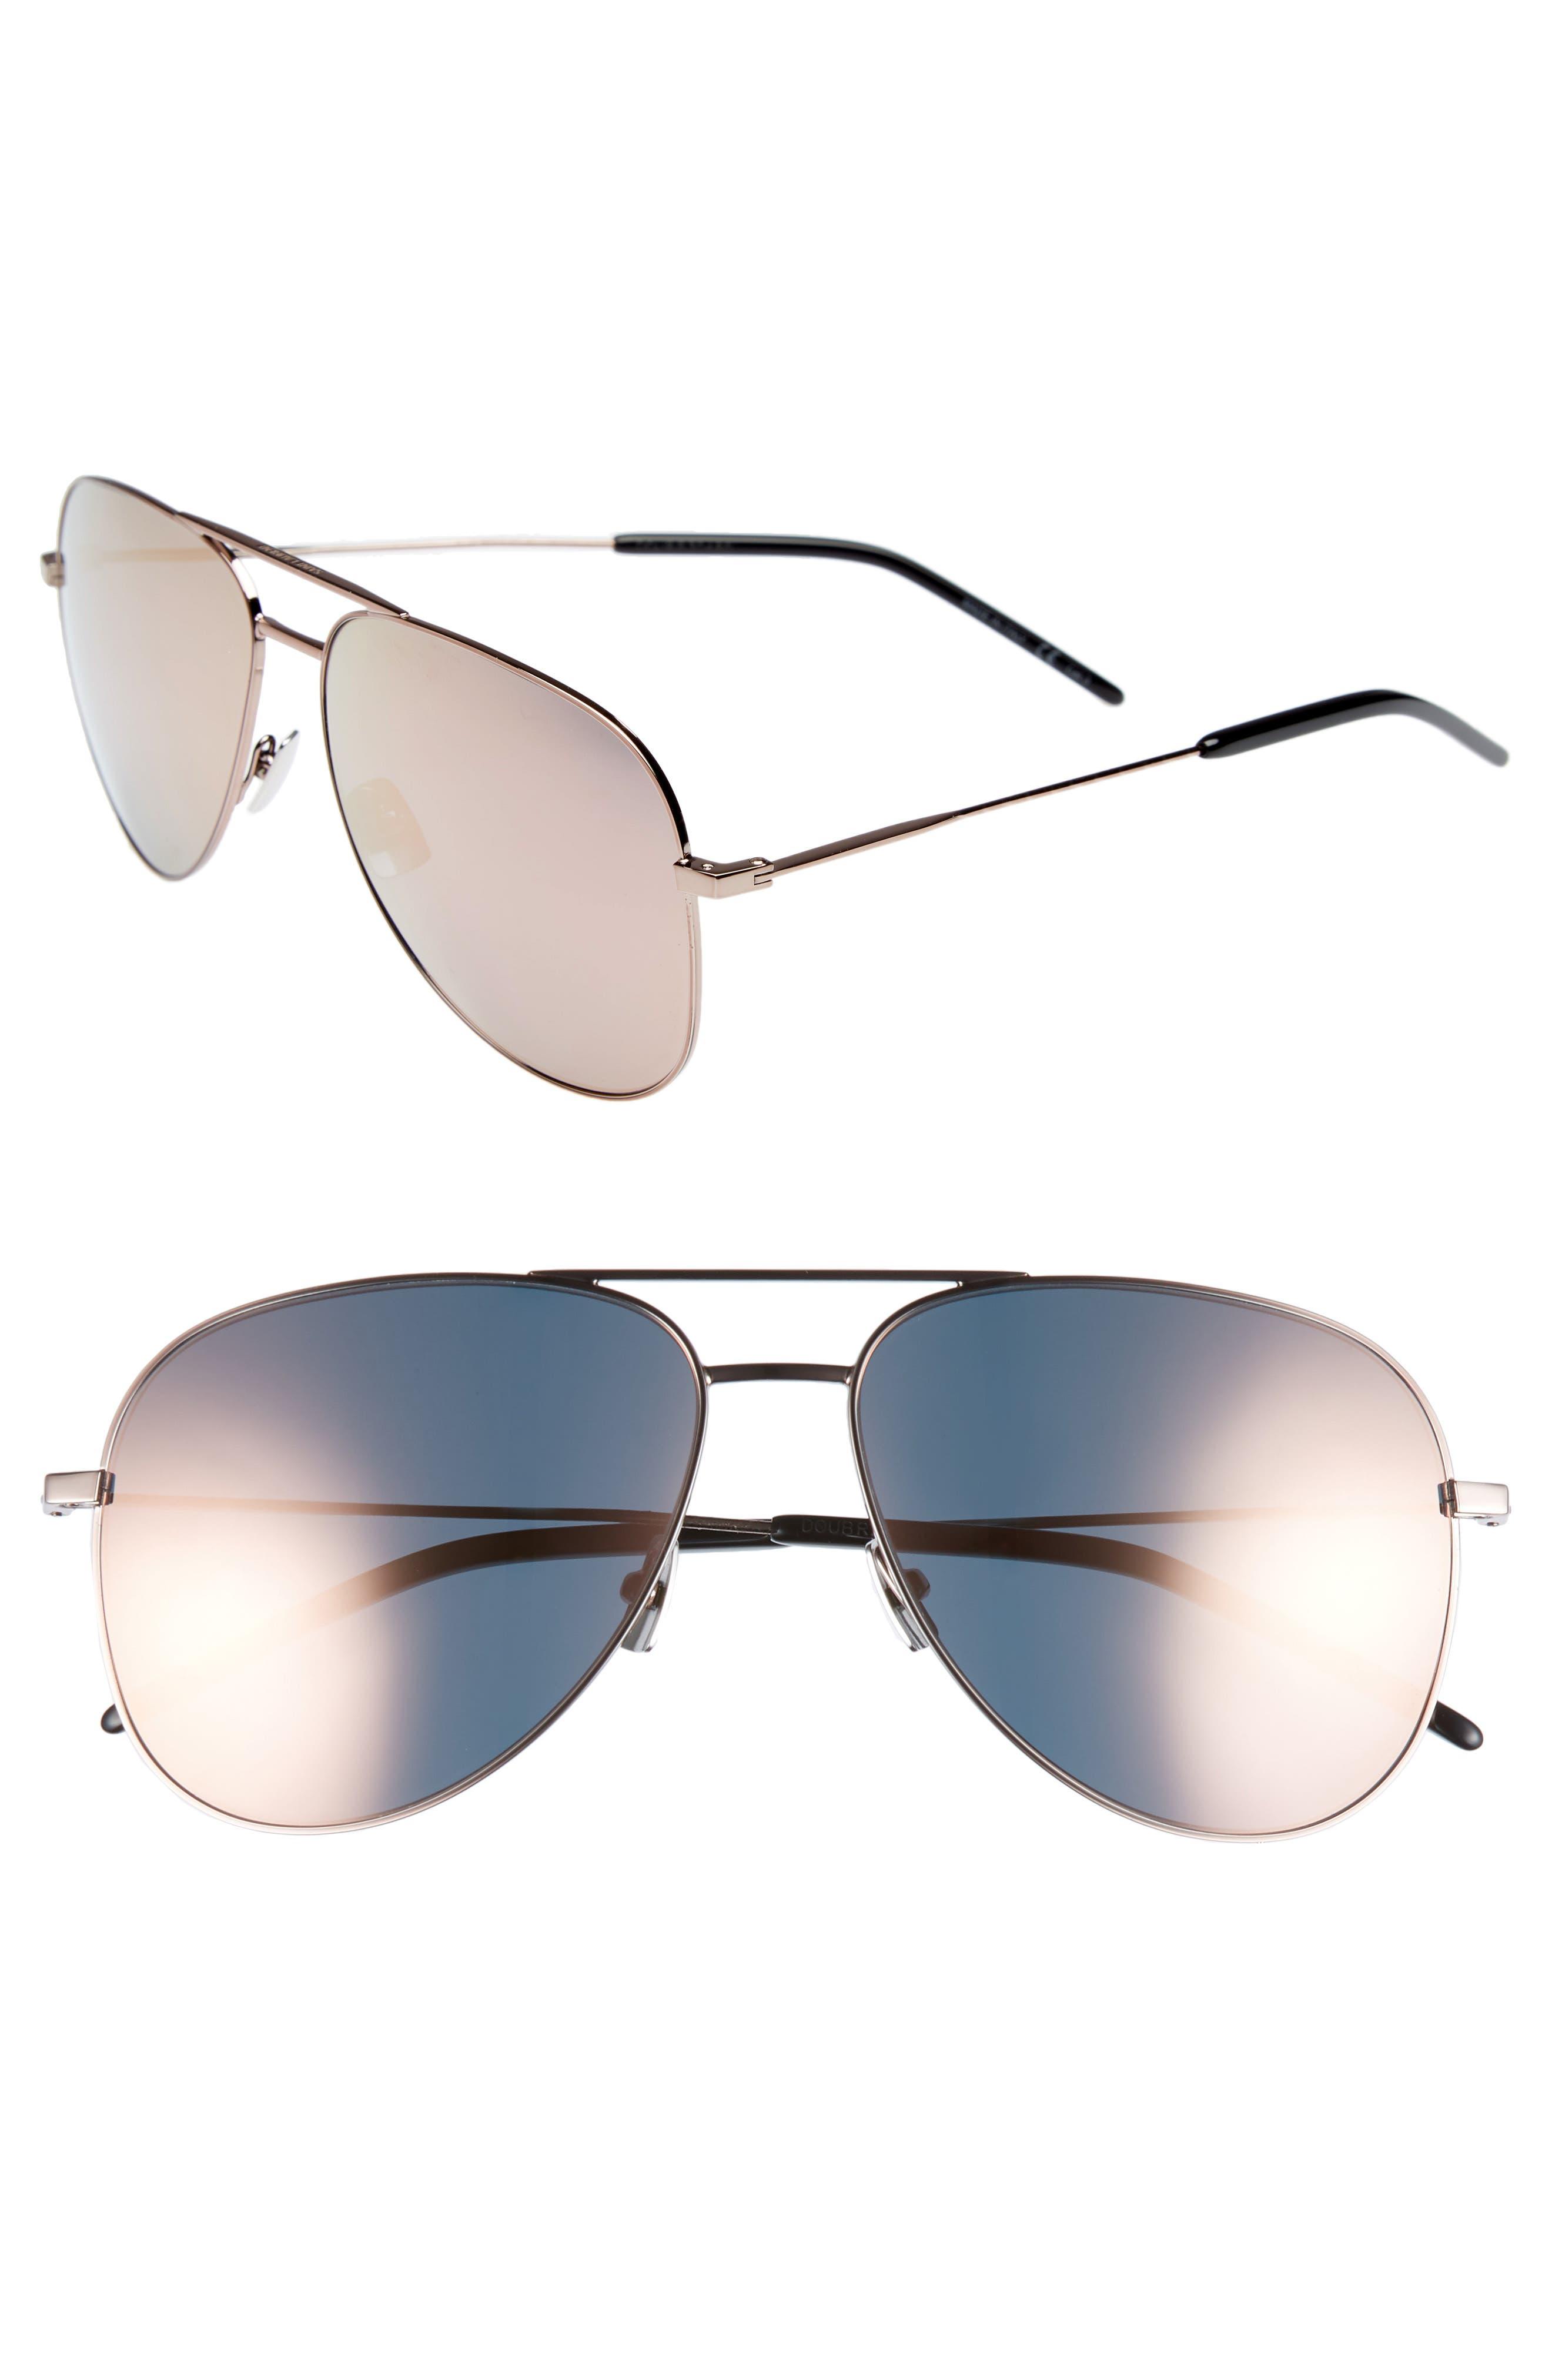 59mm Brow Bar Aviator Sunglasses,                         Main,                         color, Champagne